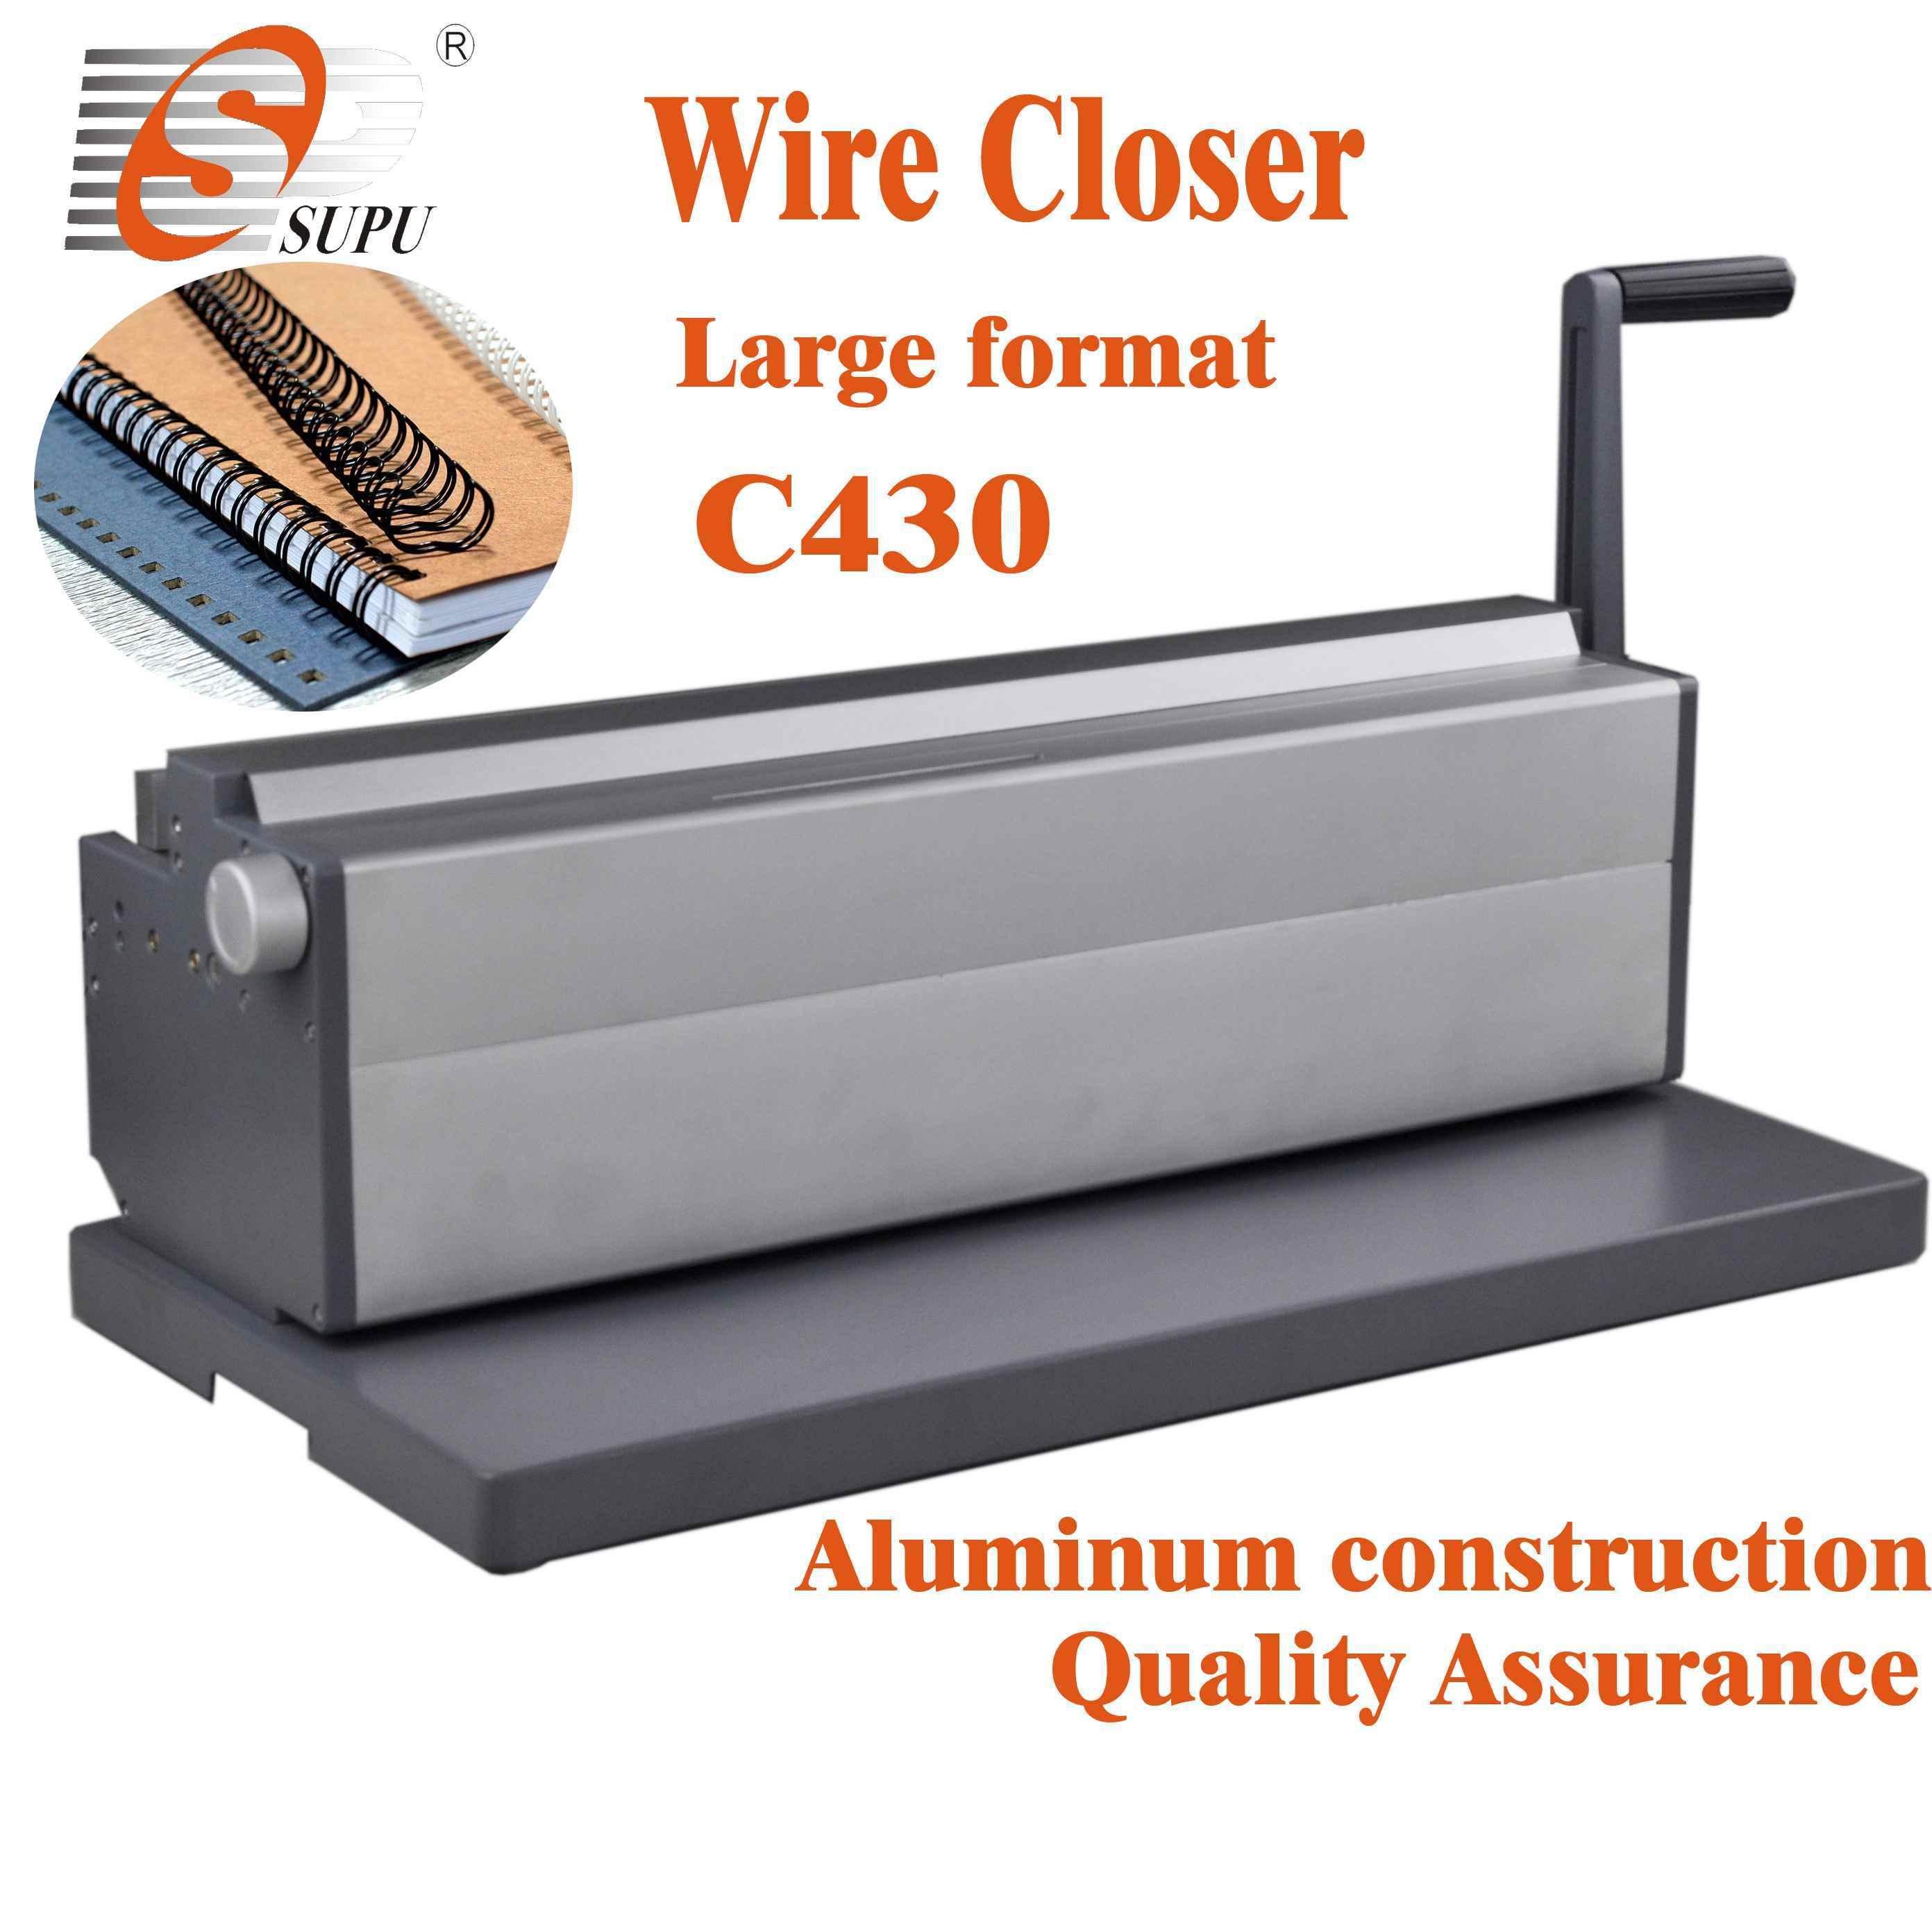 Heavy Duty Wire Closer (C430)